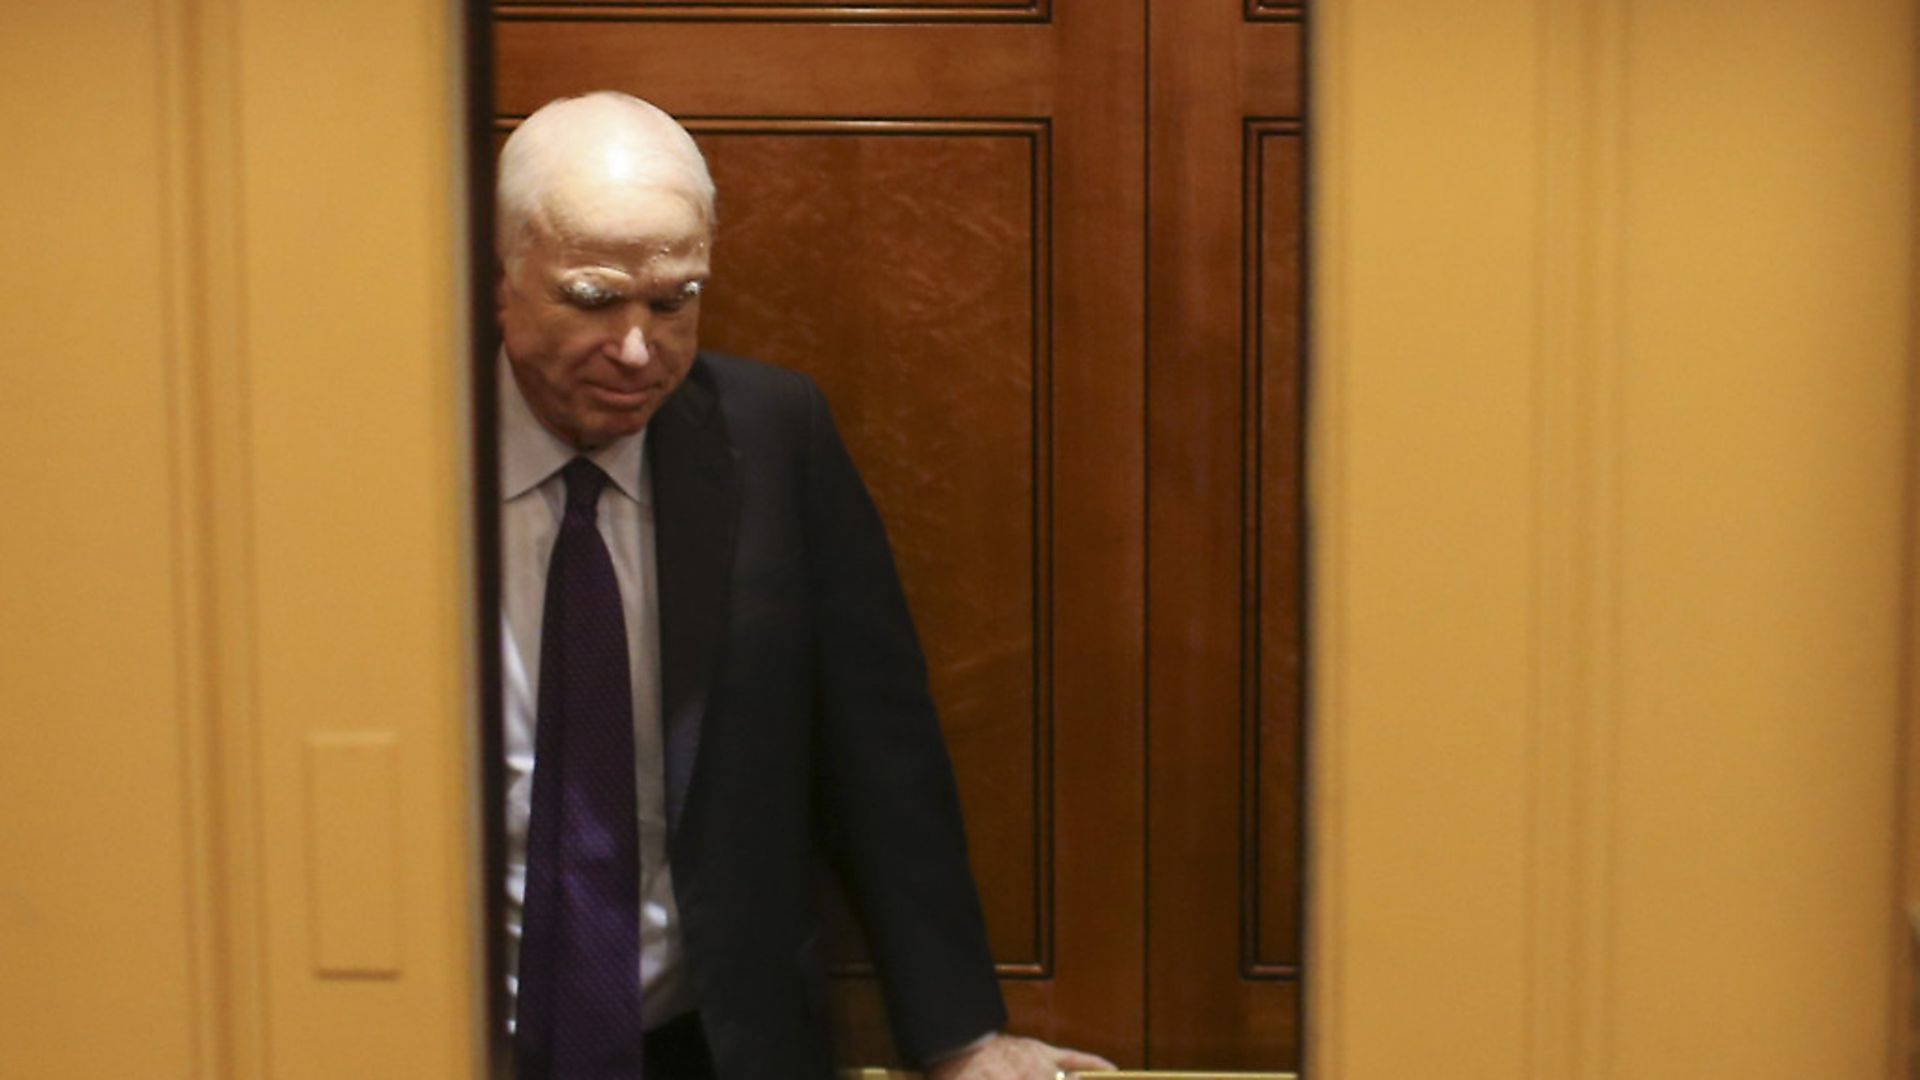 Sen. John McCain  (Photo by Oliver Contreras) - Credit: SIPA USA/PA Images